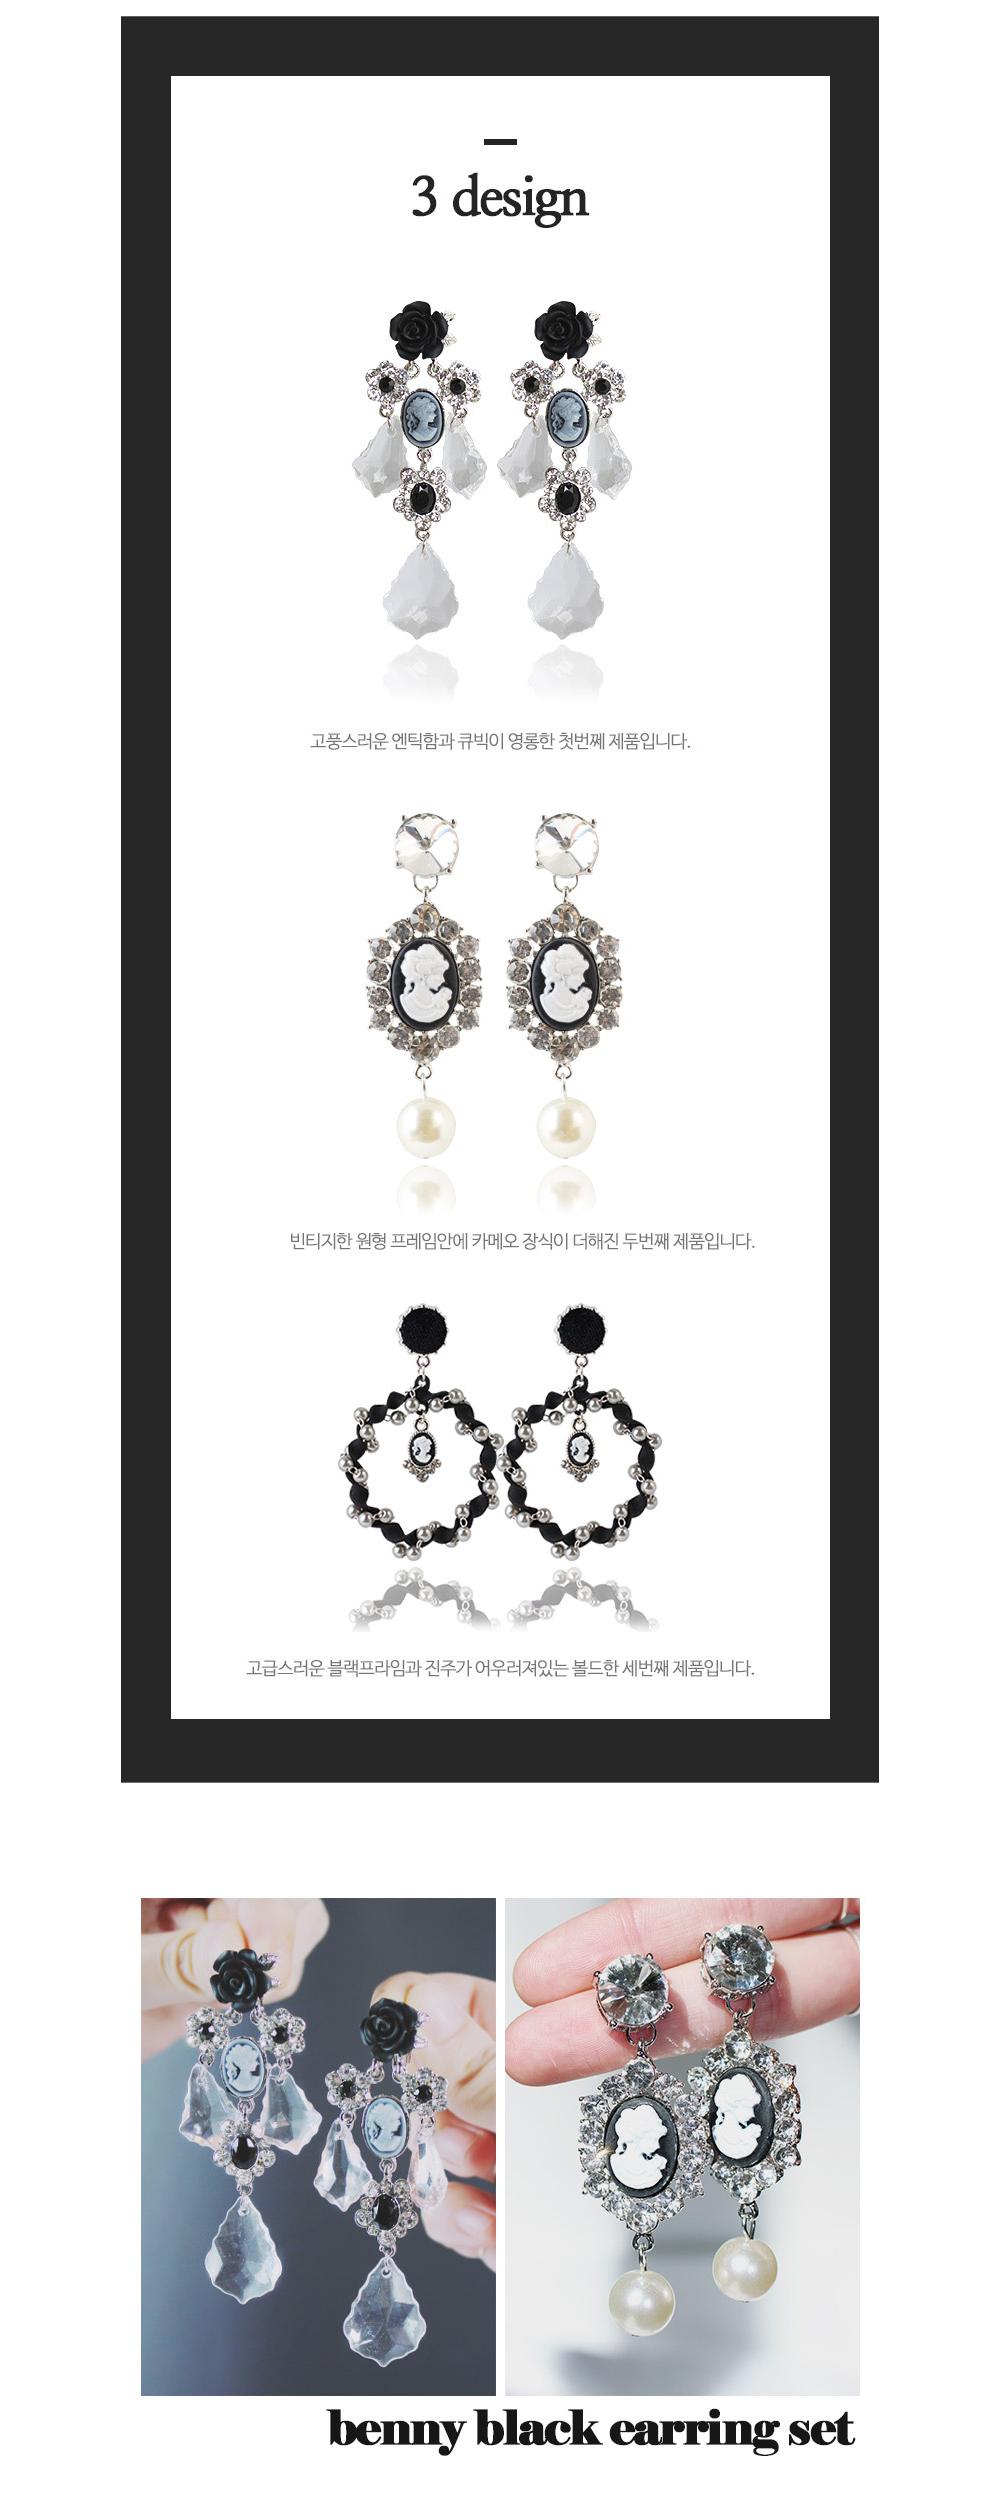 (silver925) 블랙 페미닌 귀걸이3개세트 - 투틸다, 16,900원, 진주/원석, 볼귀걸이